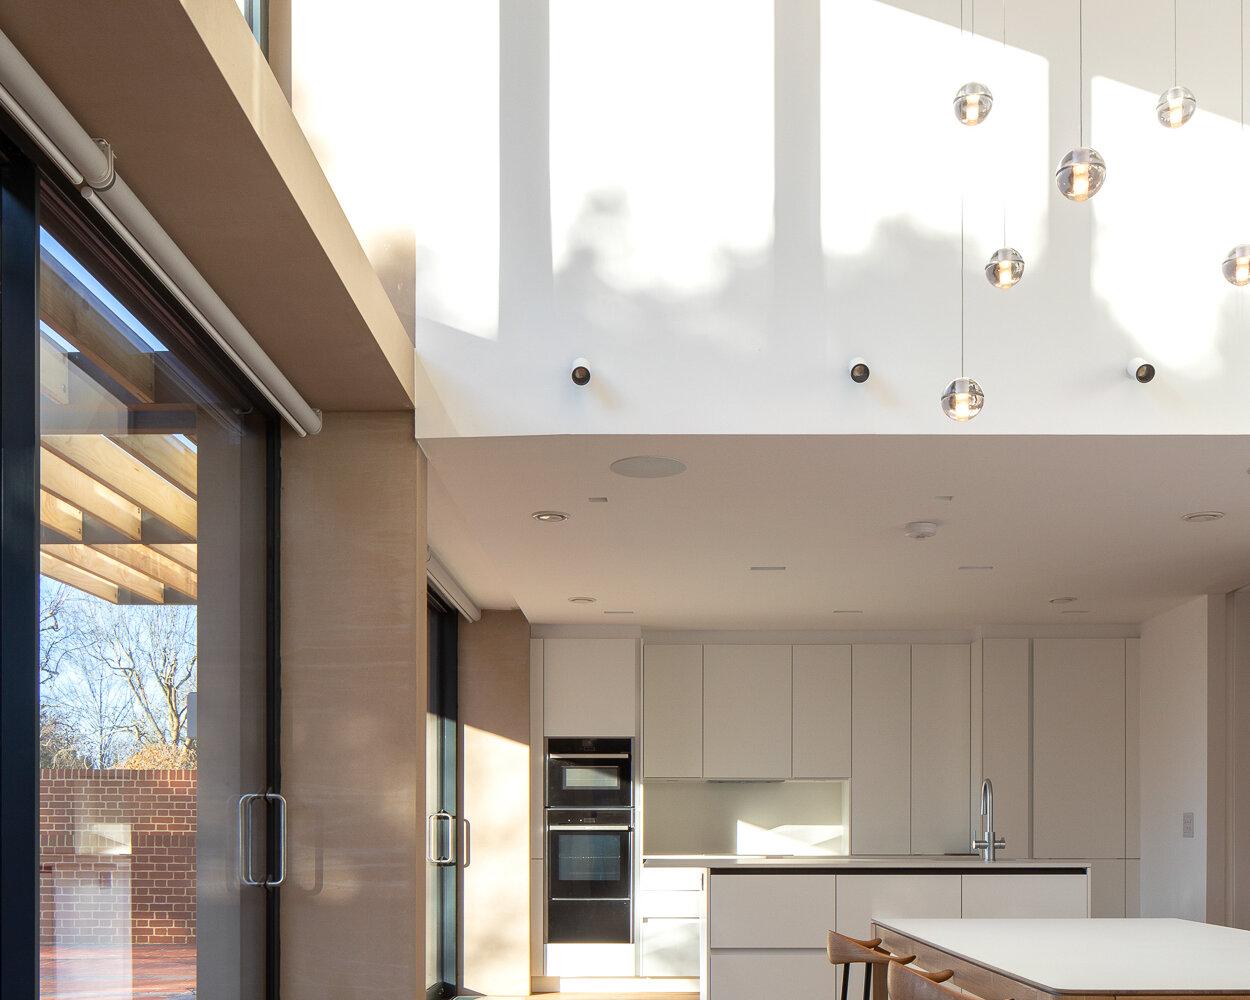 Private house kitchen atrium interior